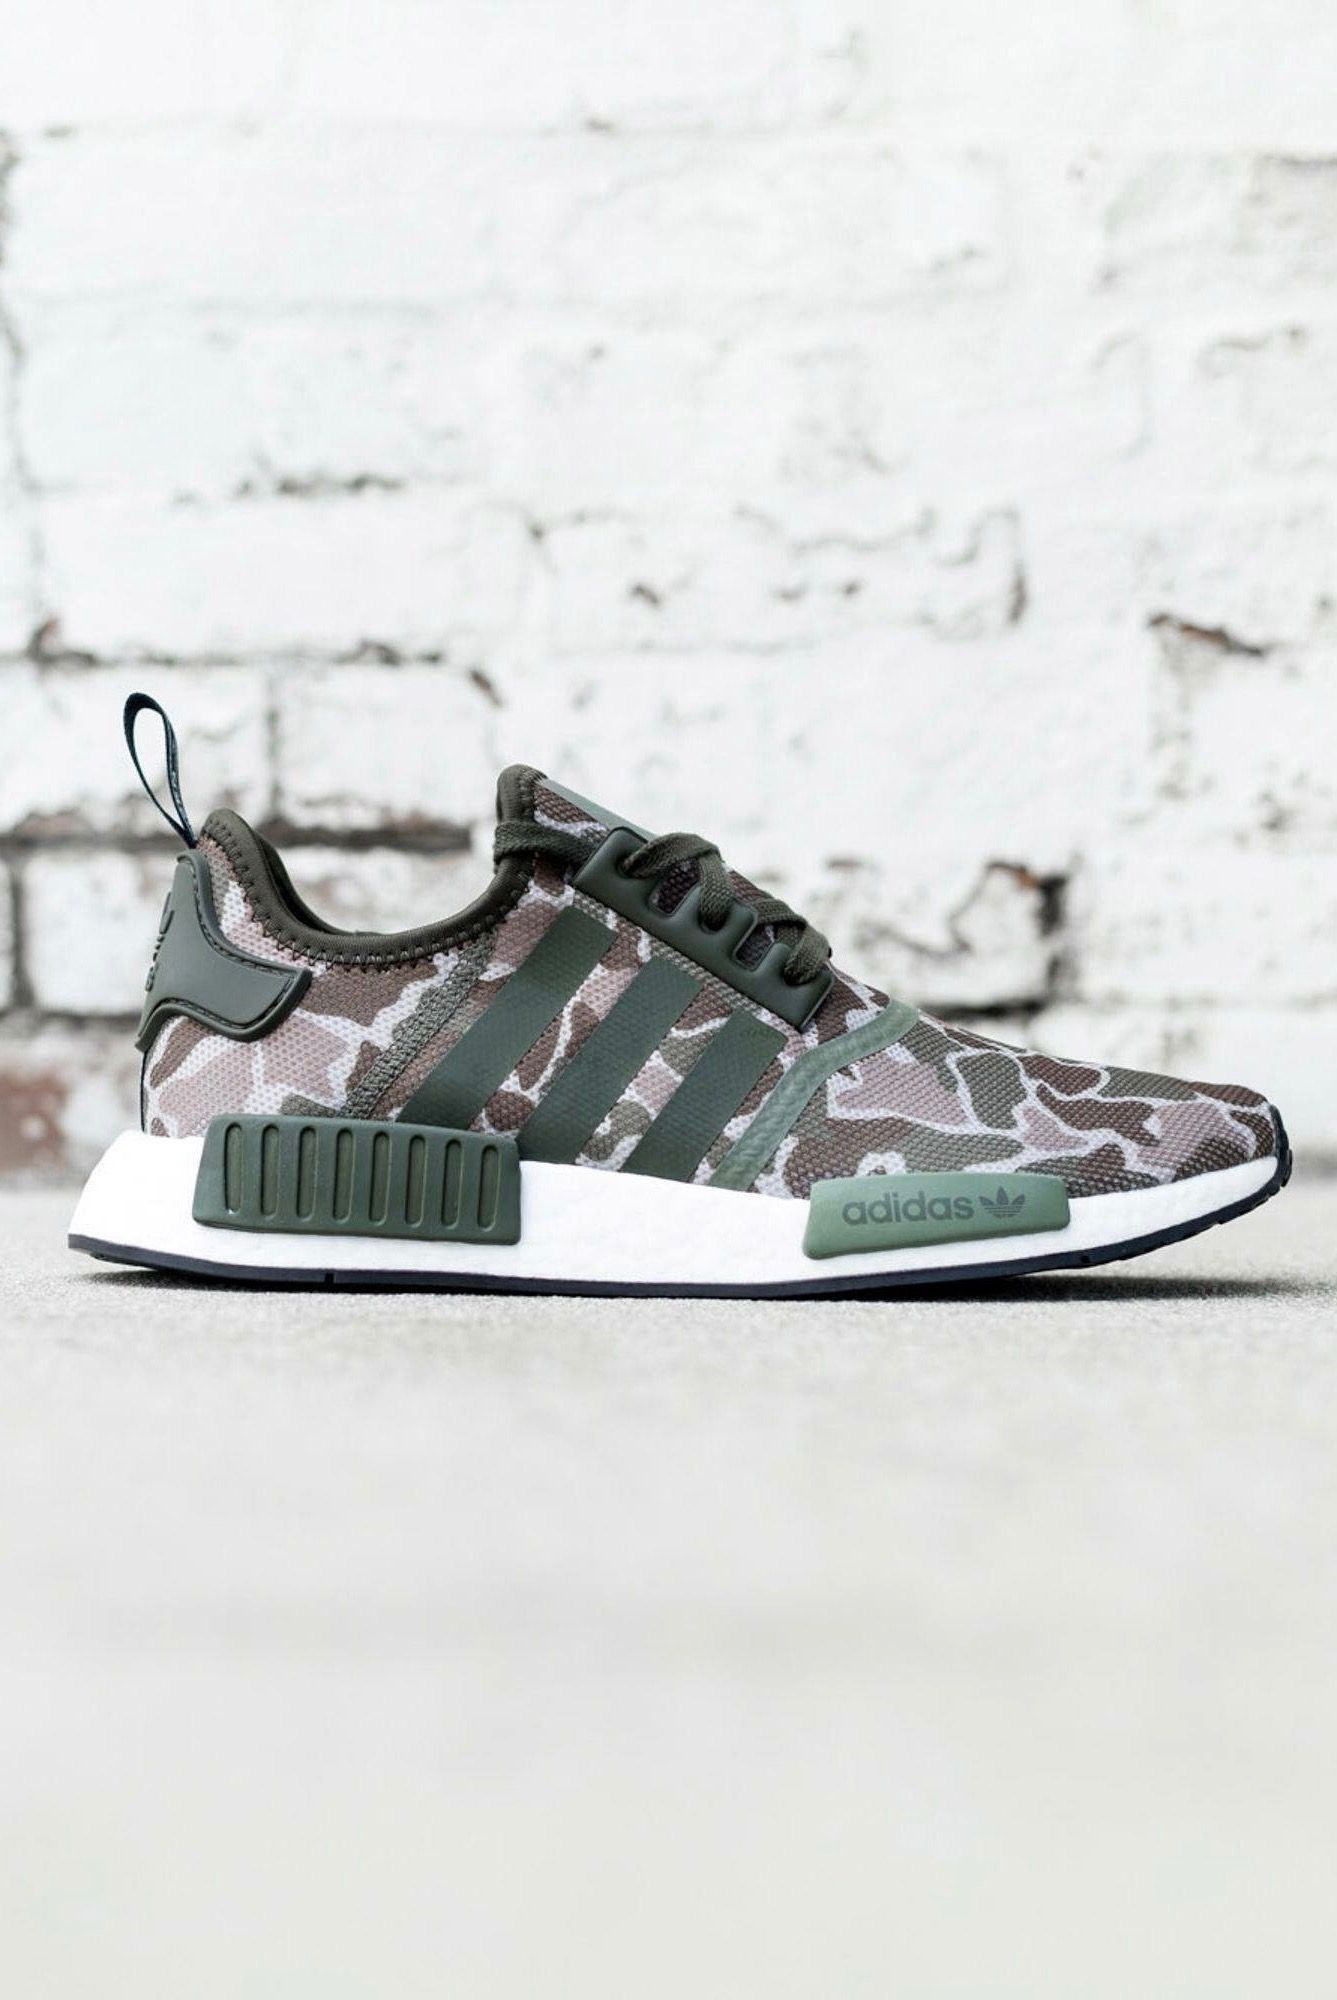 adidas Originals NMD Adidas sneakers, Modern shoes, Sneakers